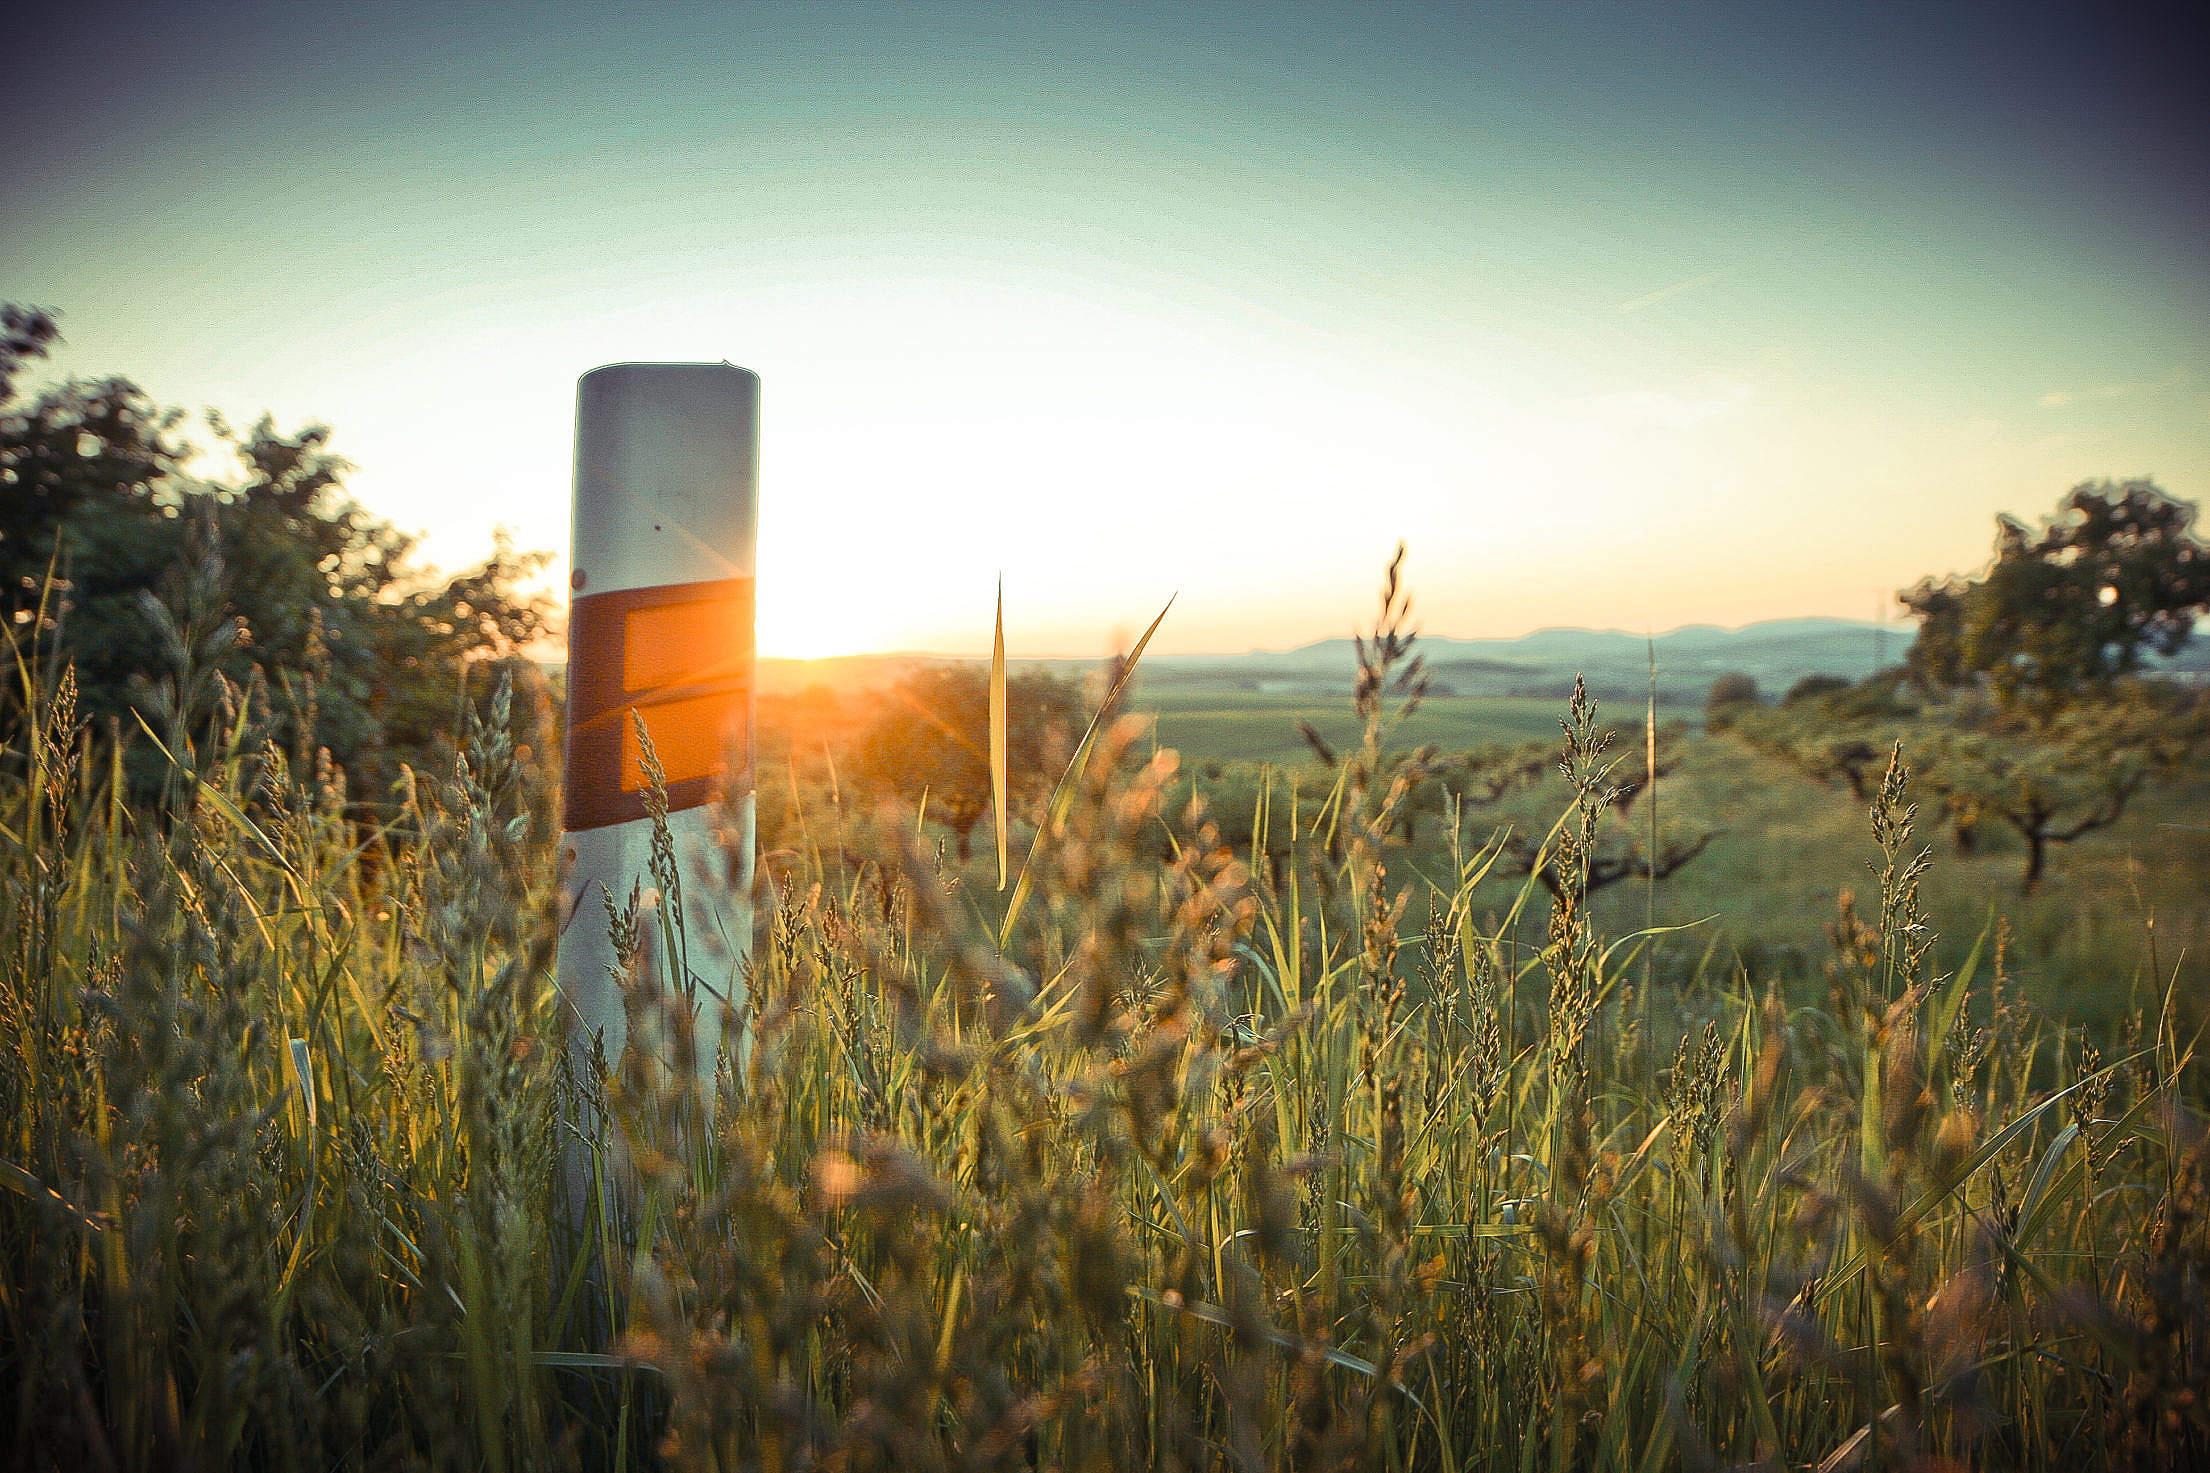 A Road Bollard Free Stock Photo